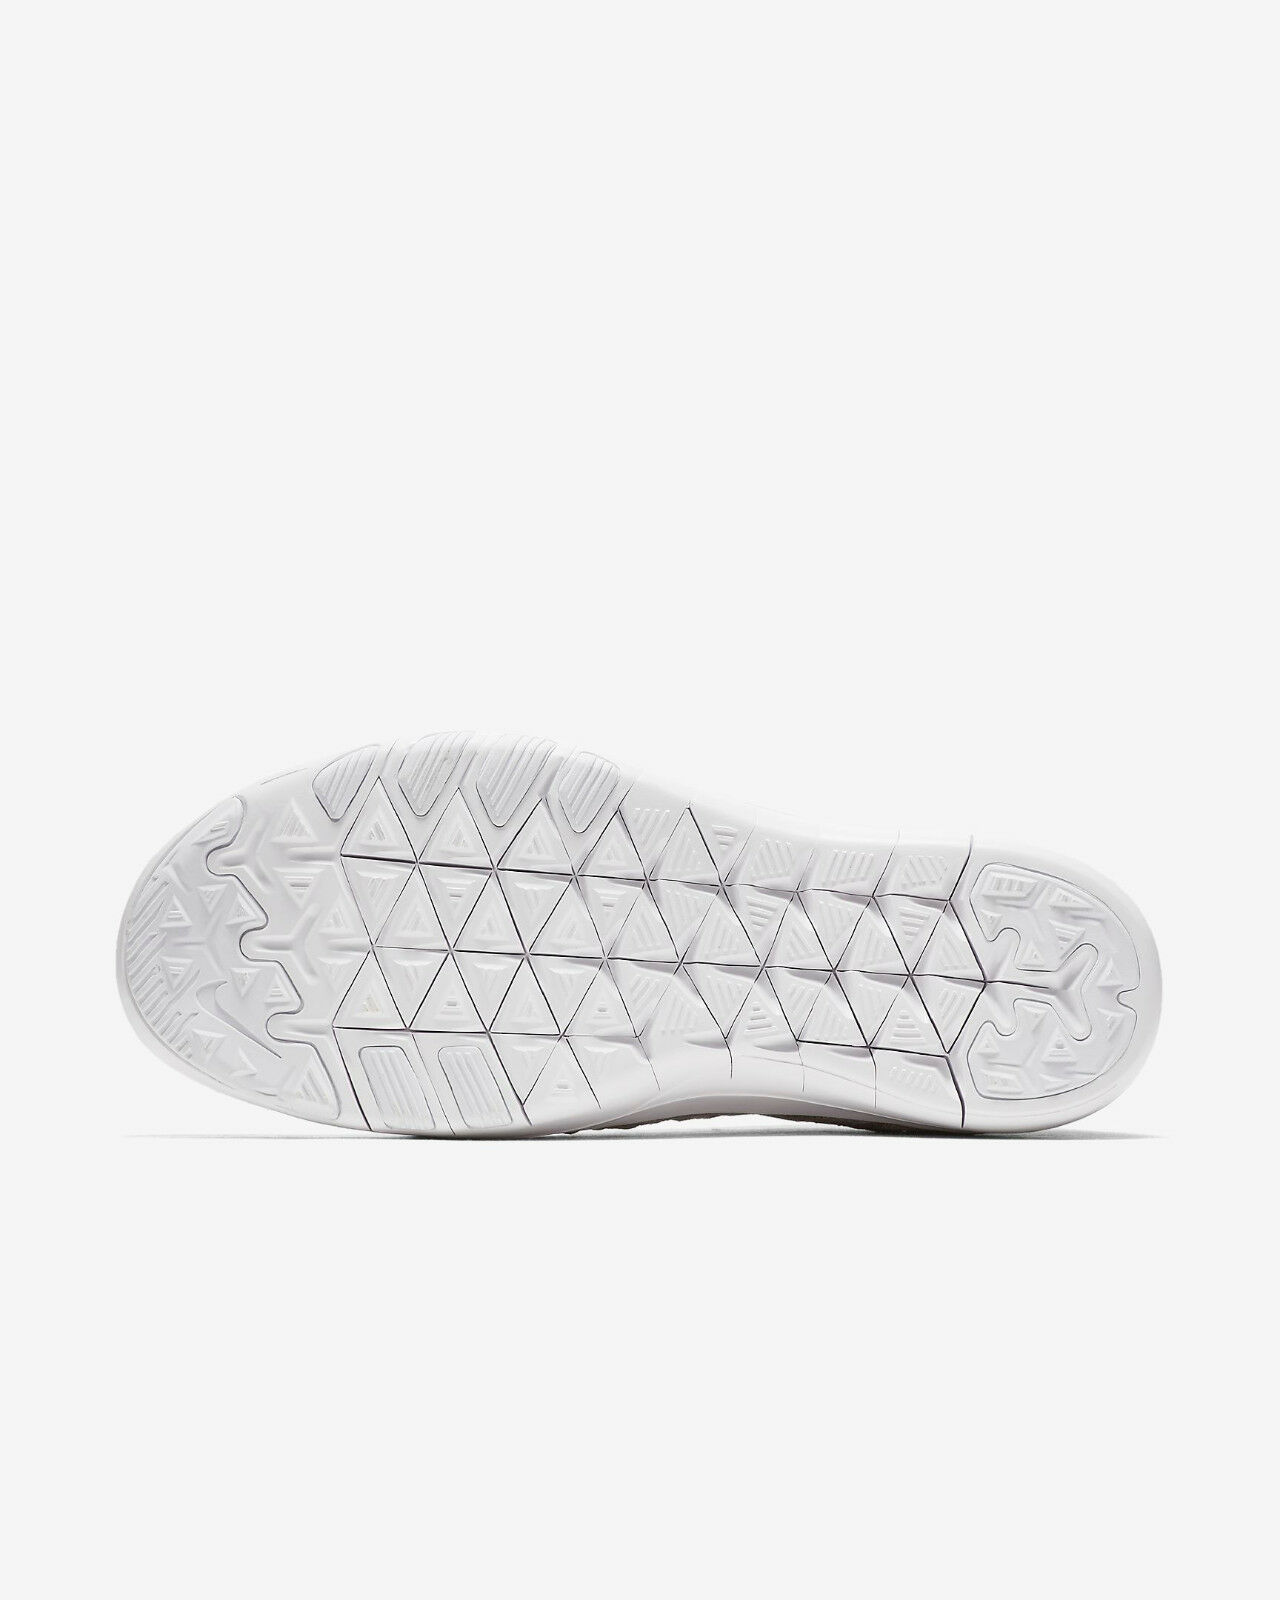 Nike TR Mujeres Free TR Nike flyknikt 2 Zapatos atmósfera gris armas Moke Blanco 904658 016 4f643d